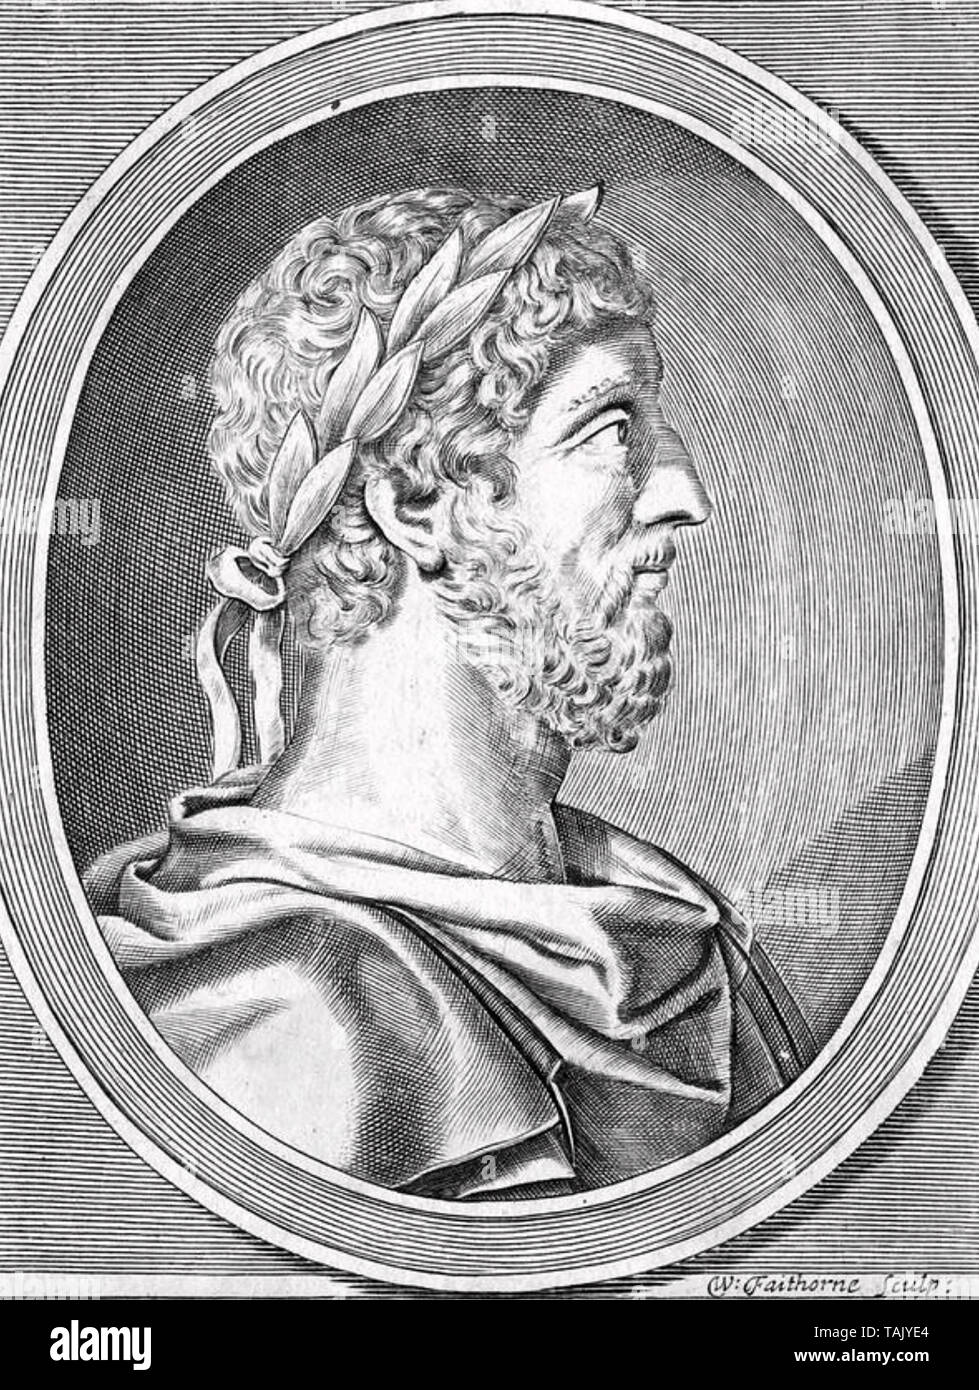 MARCUS AURELIUS (121 - 180), römischer Kaiser Stockfoto